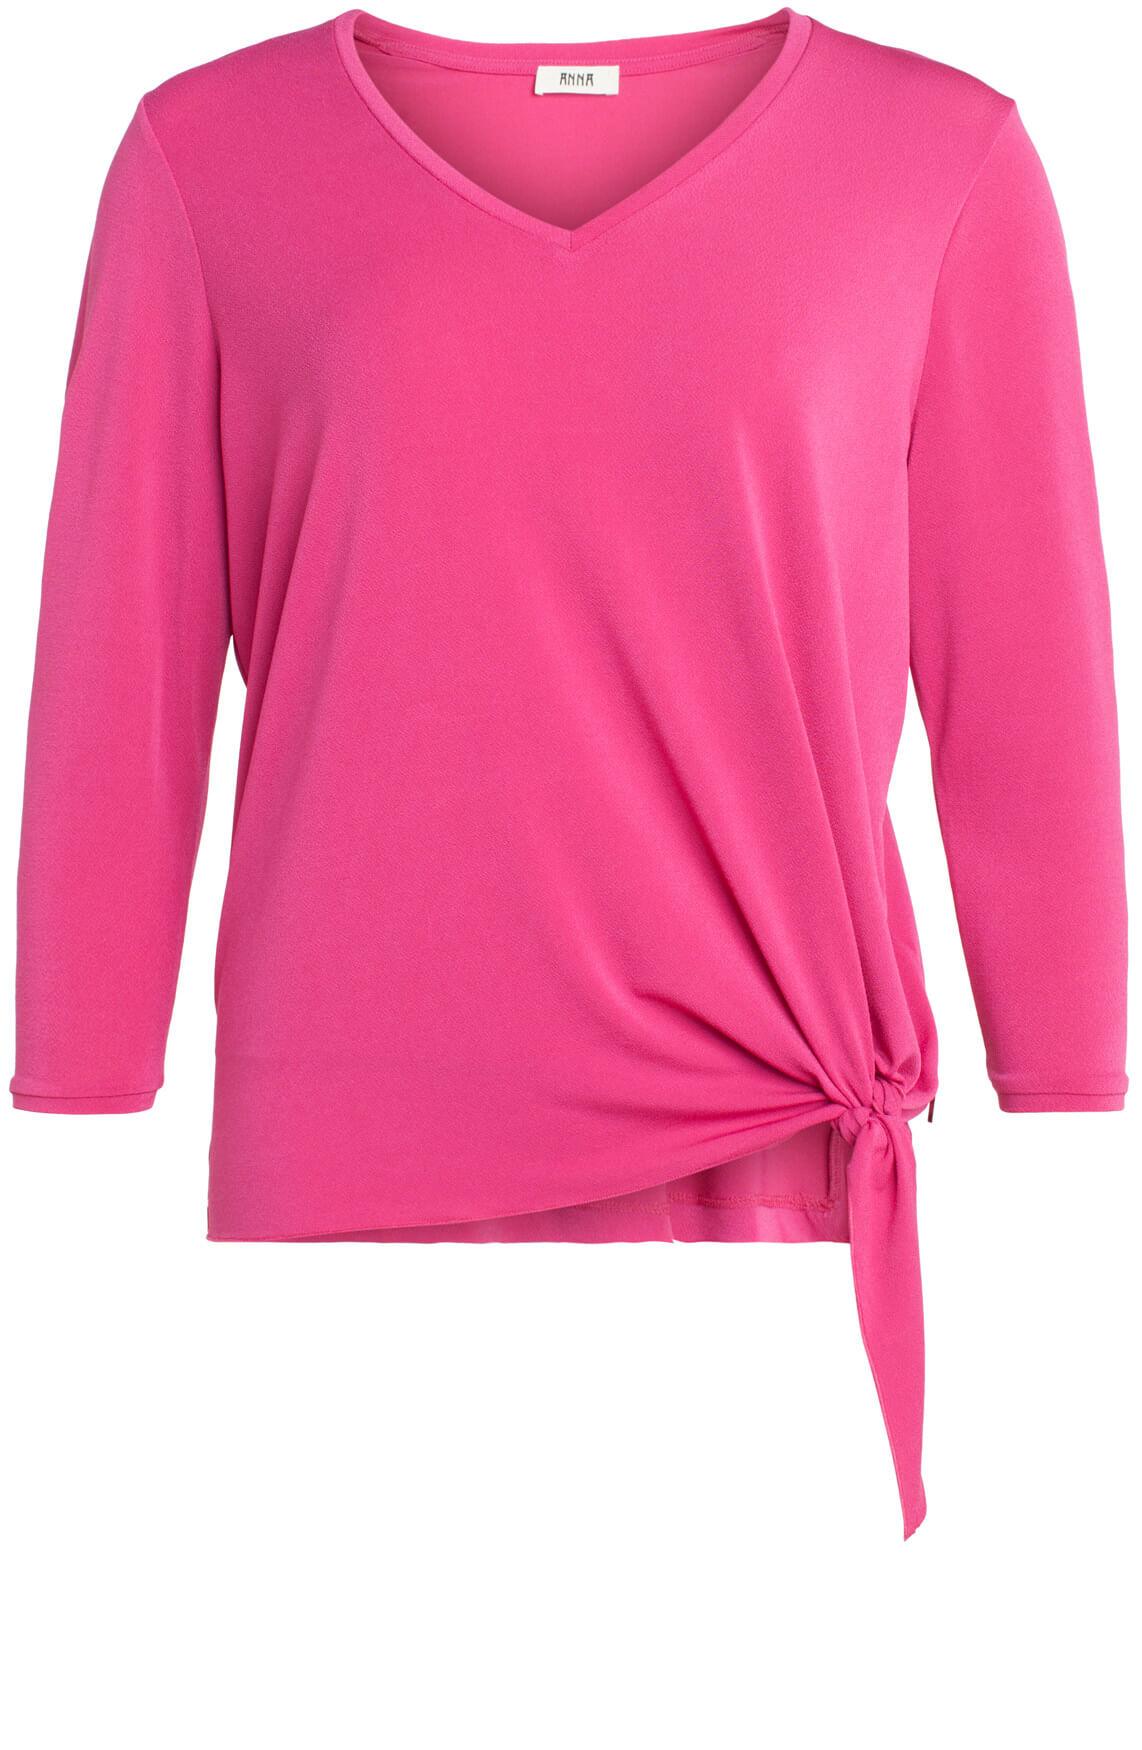 Anna Dames Shirt met knoopdetail roze